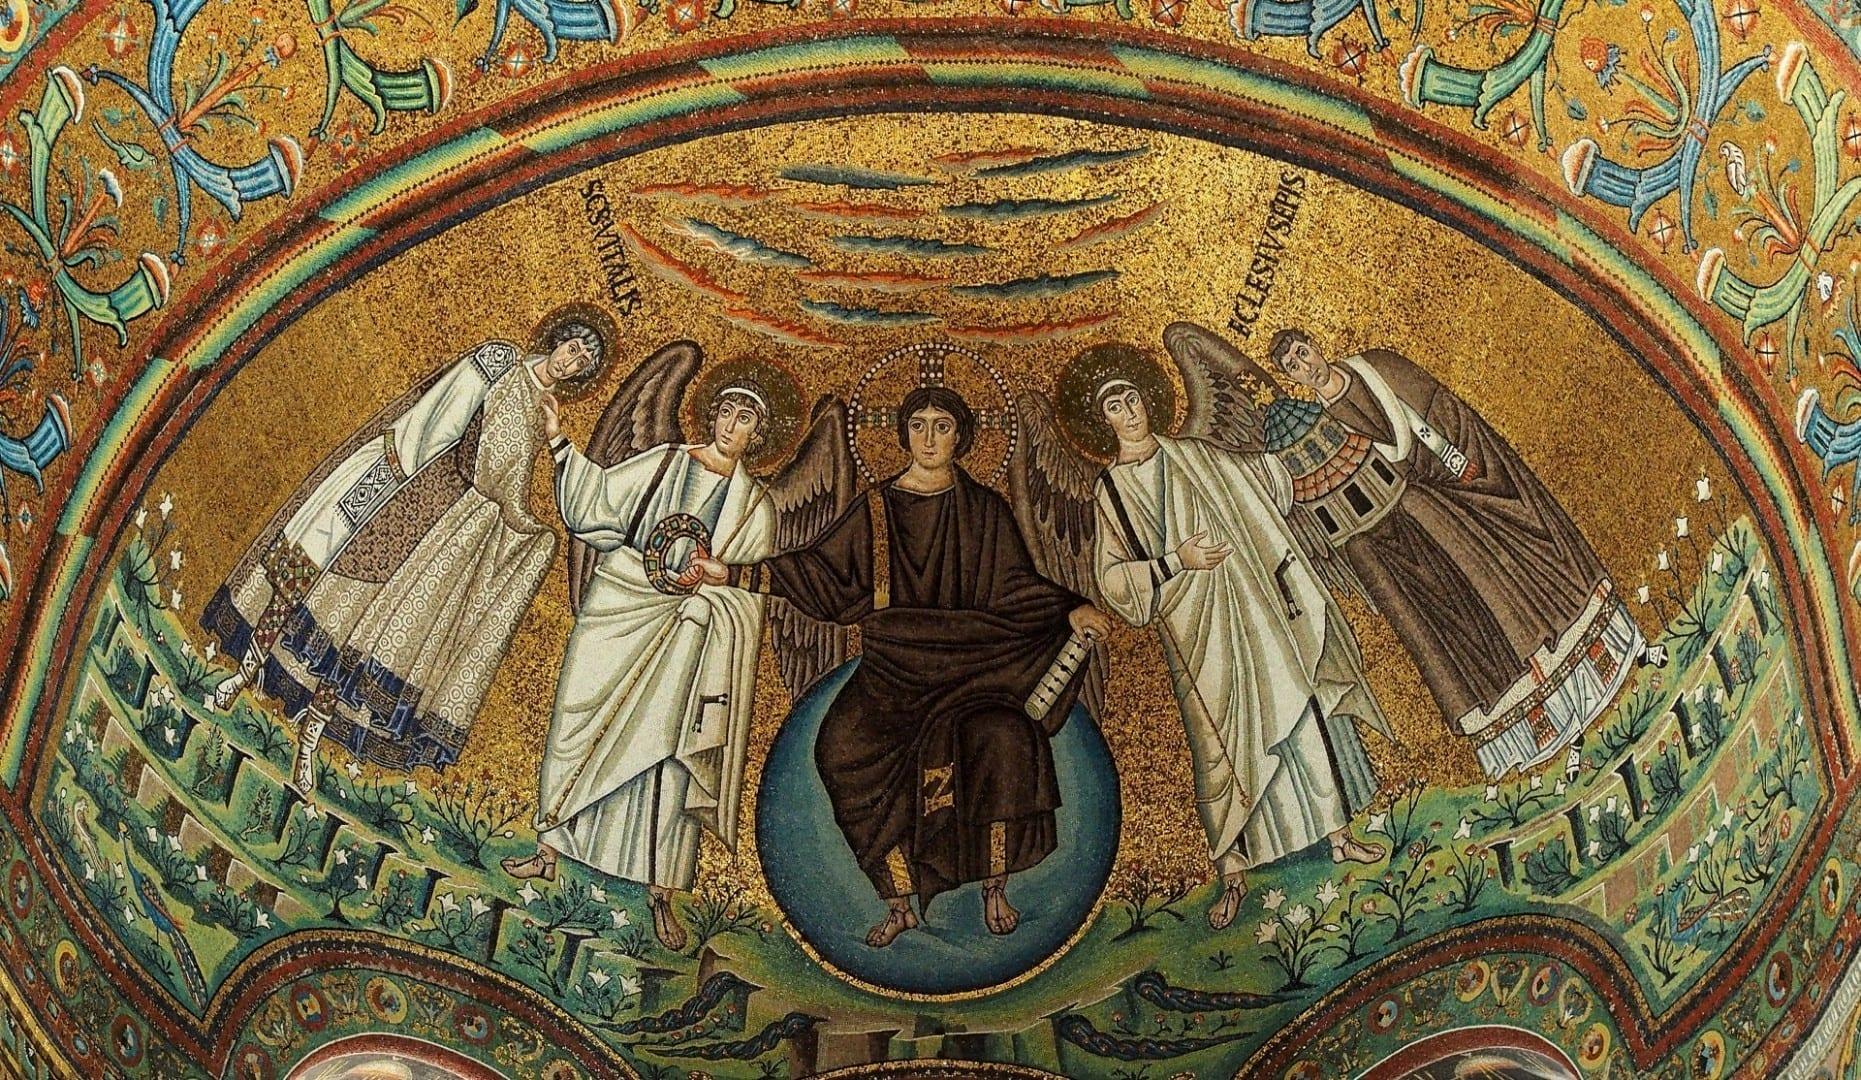 Mosaico del ábside - Basílica de San Vitale Ravenna Italia